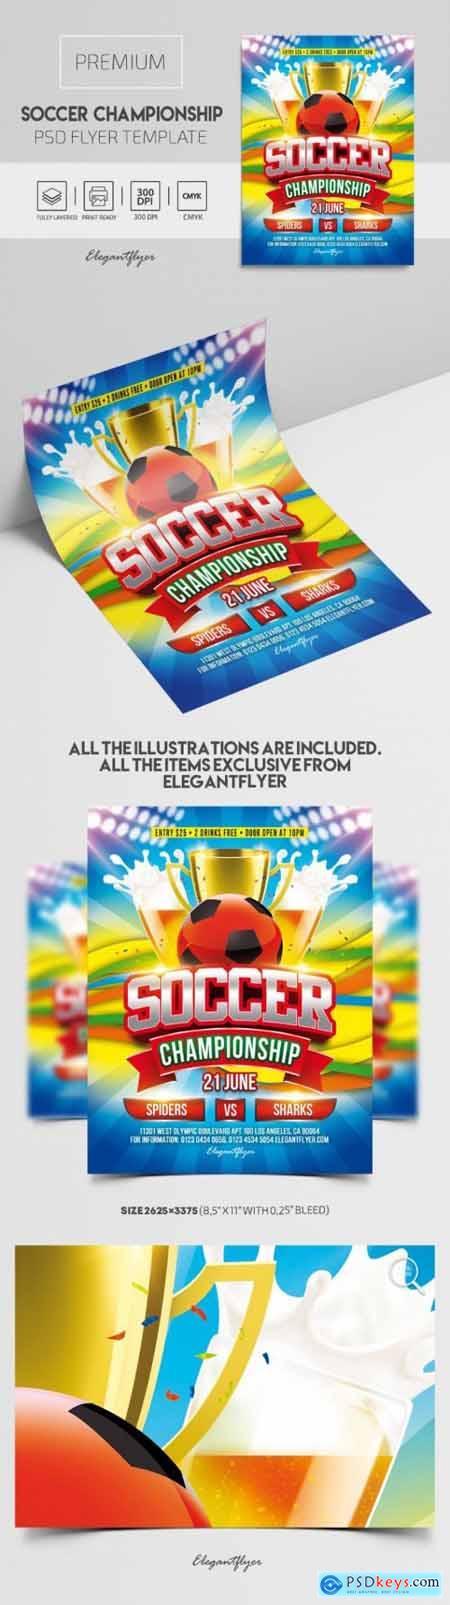 Soccer Championship – Premium PSD Flyer Template